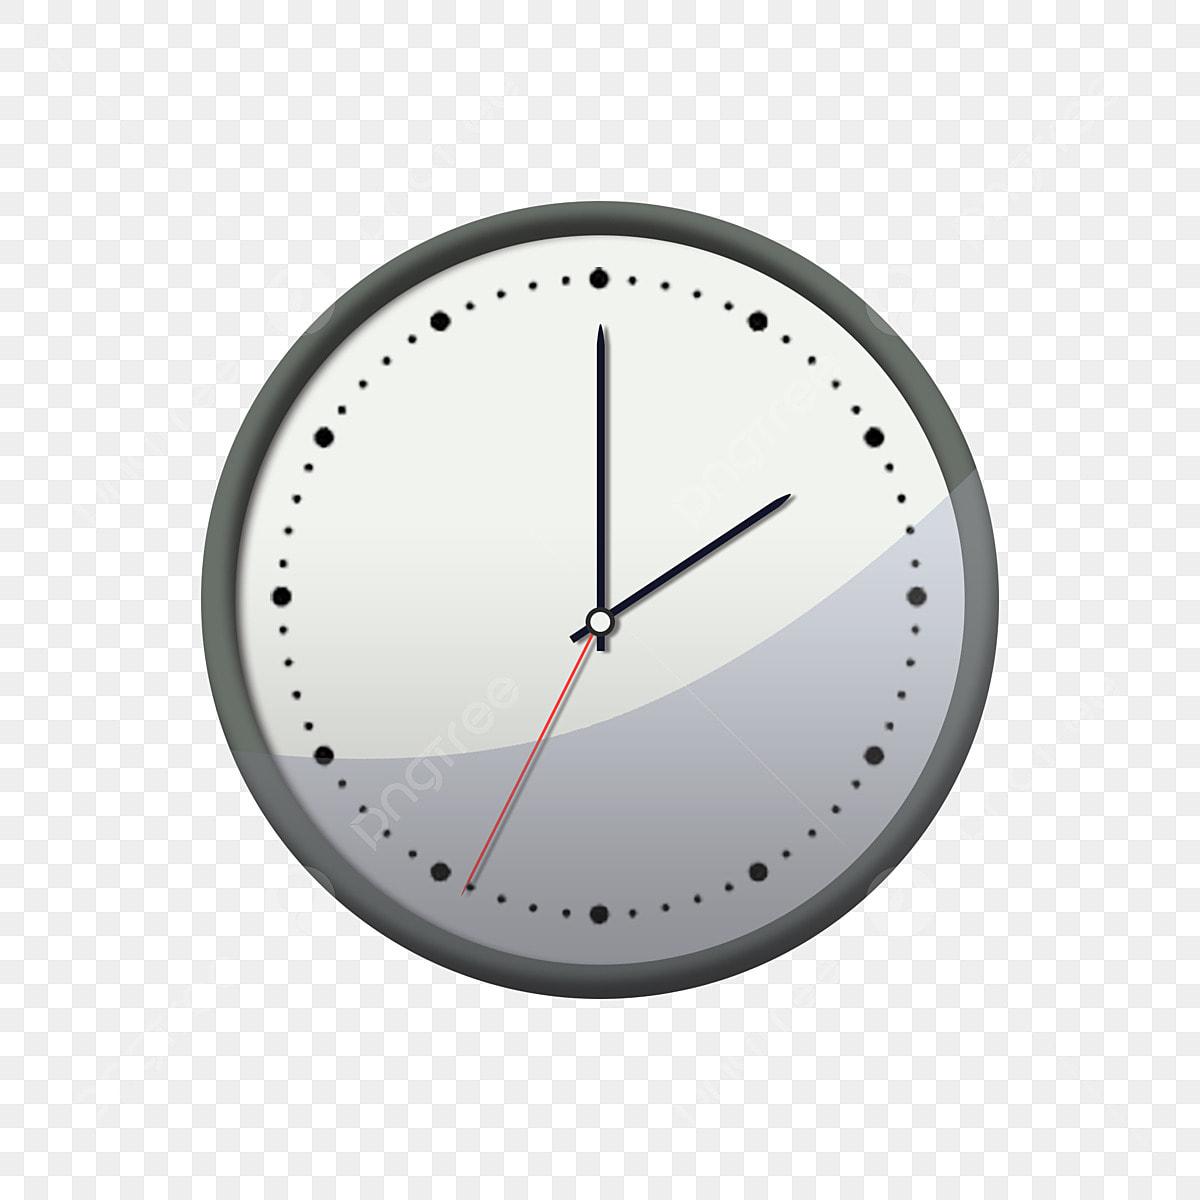 Relojes Colgantes Hora Manecillas Del Reloj Mesa Redonda Del Reloj De  Pared, Relojes Colgantes, Hora, Manecillas Del Reloj PNG y PSD para  Descargar Gratis | Pngtree